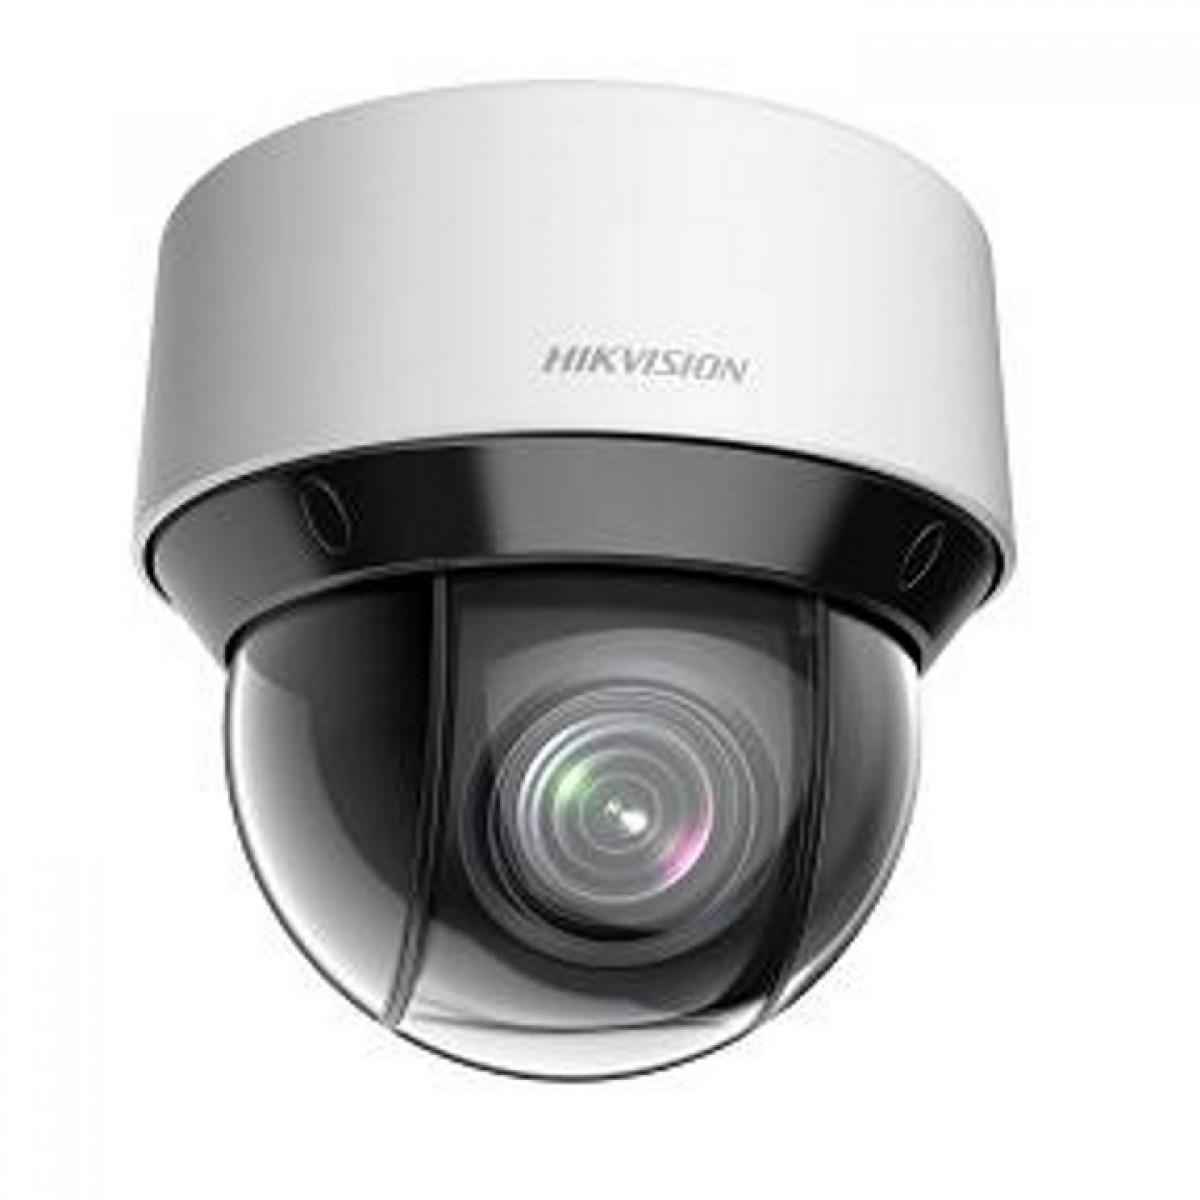 Camera IP speed dome hồng ngoại HD 2 MP, zoom xoay 4 chiều, ống kính 4.7-94mm, zoom quang học 20X. DS-2DE4A220IW-DE